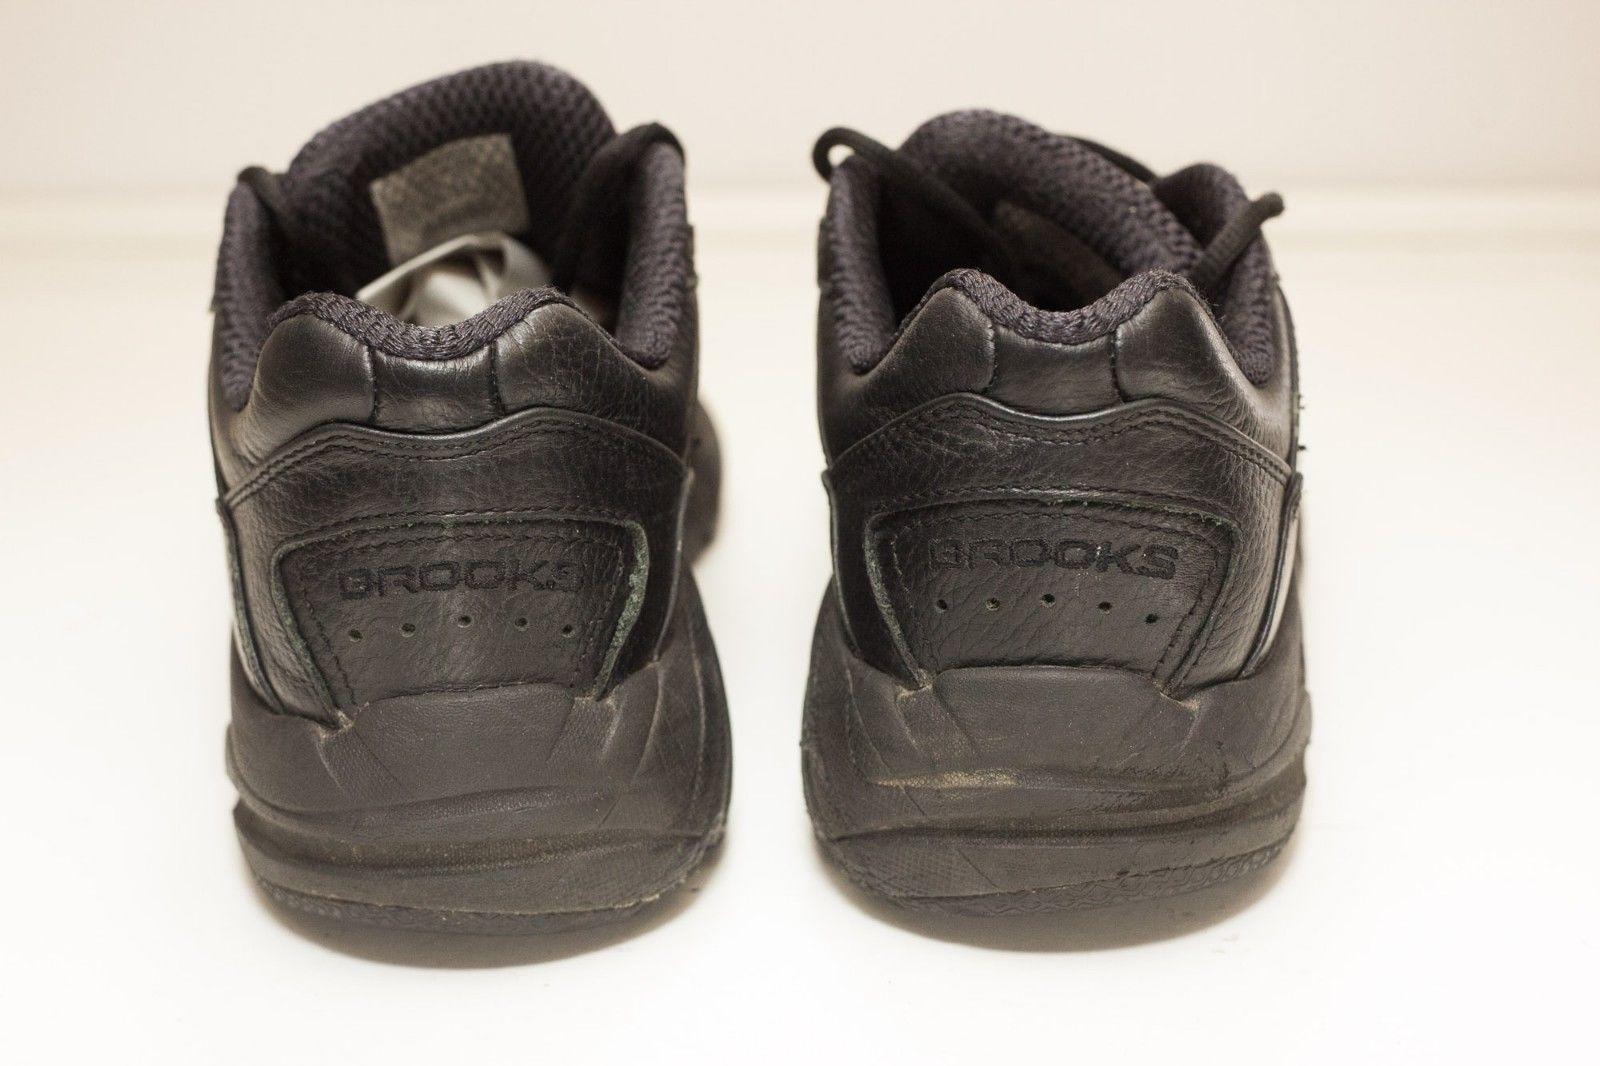 Brooks Addiction Size 10.5 2A Black Walking Shoes Women's